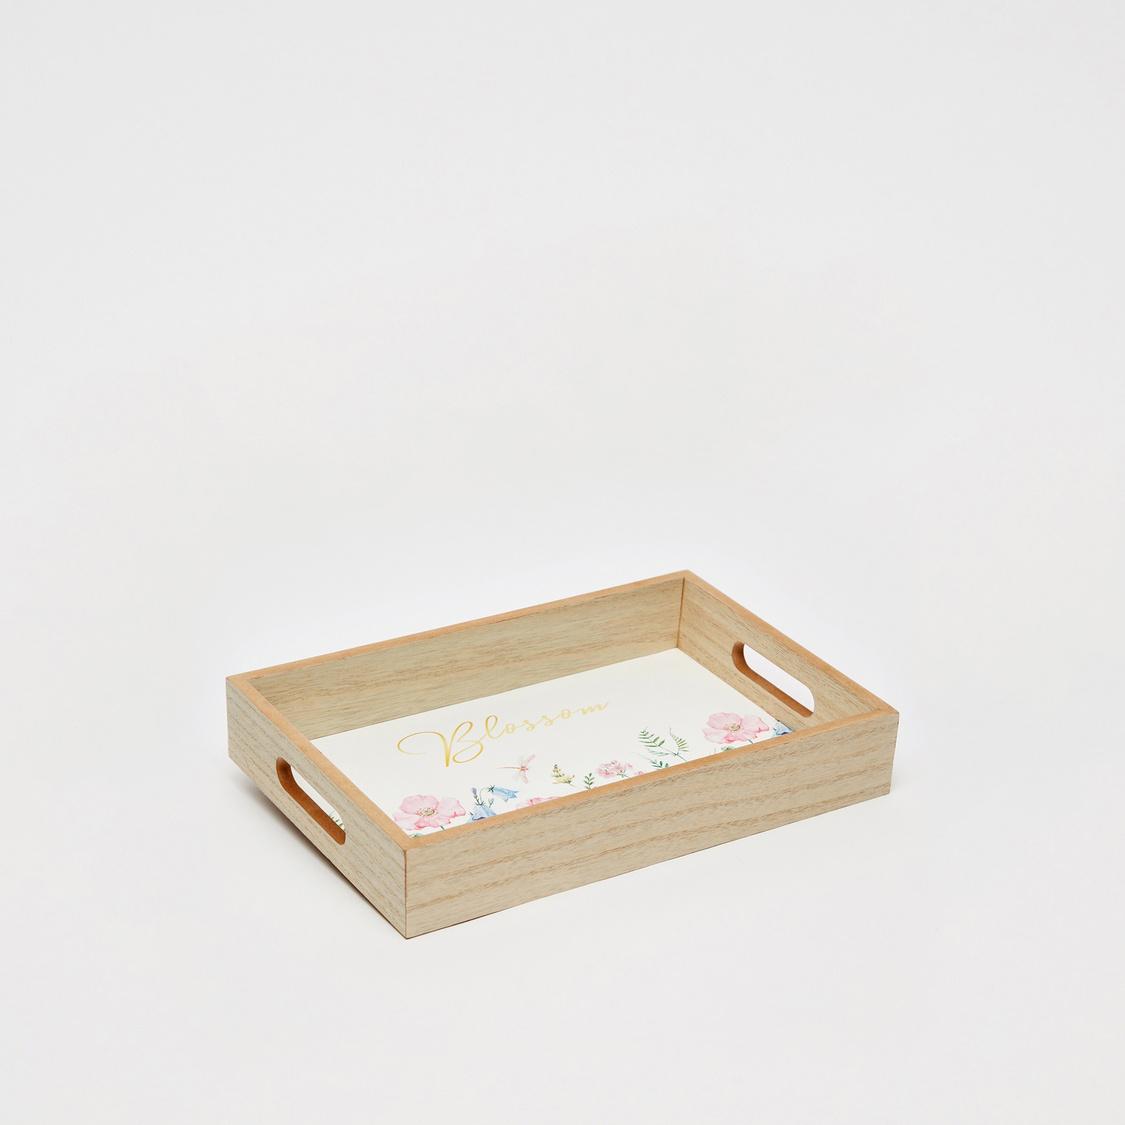 Printed Rectangular Wooden Tray - 30x20x5 cms